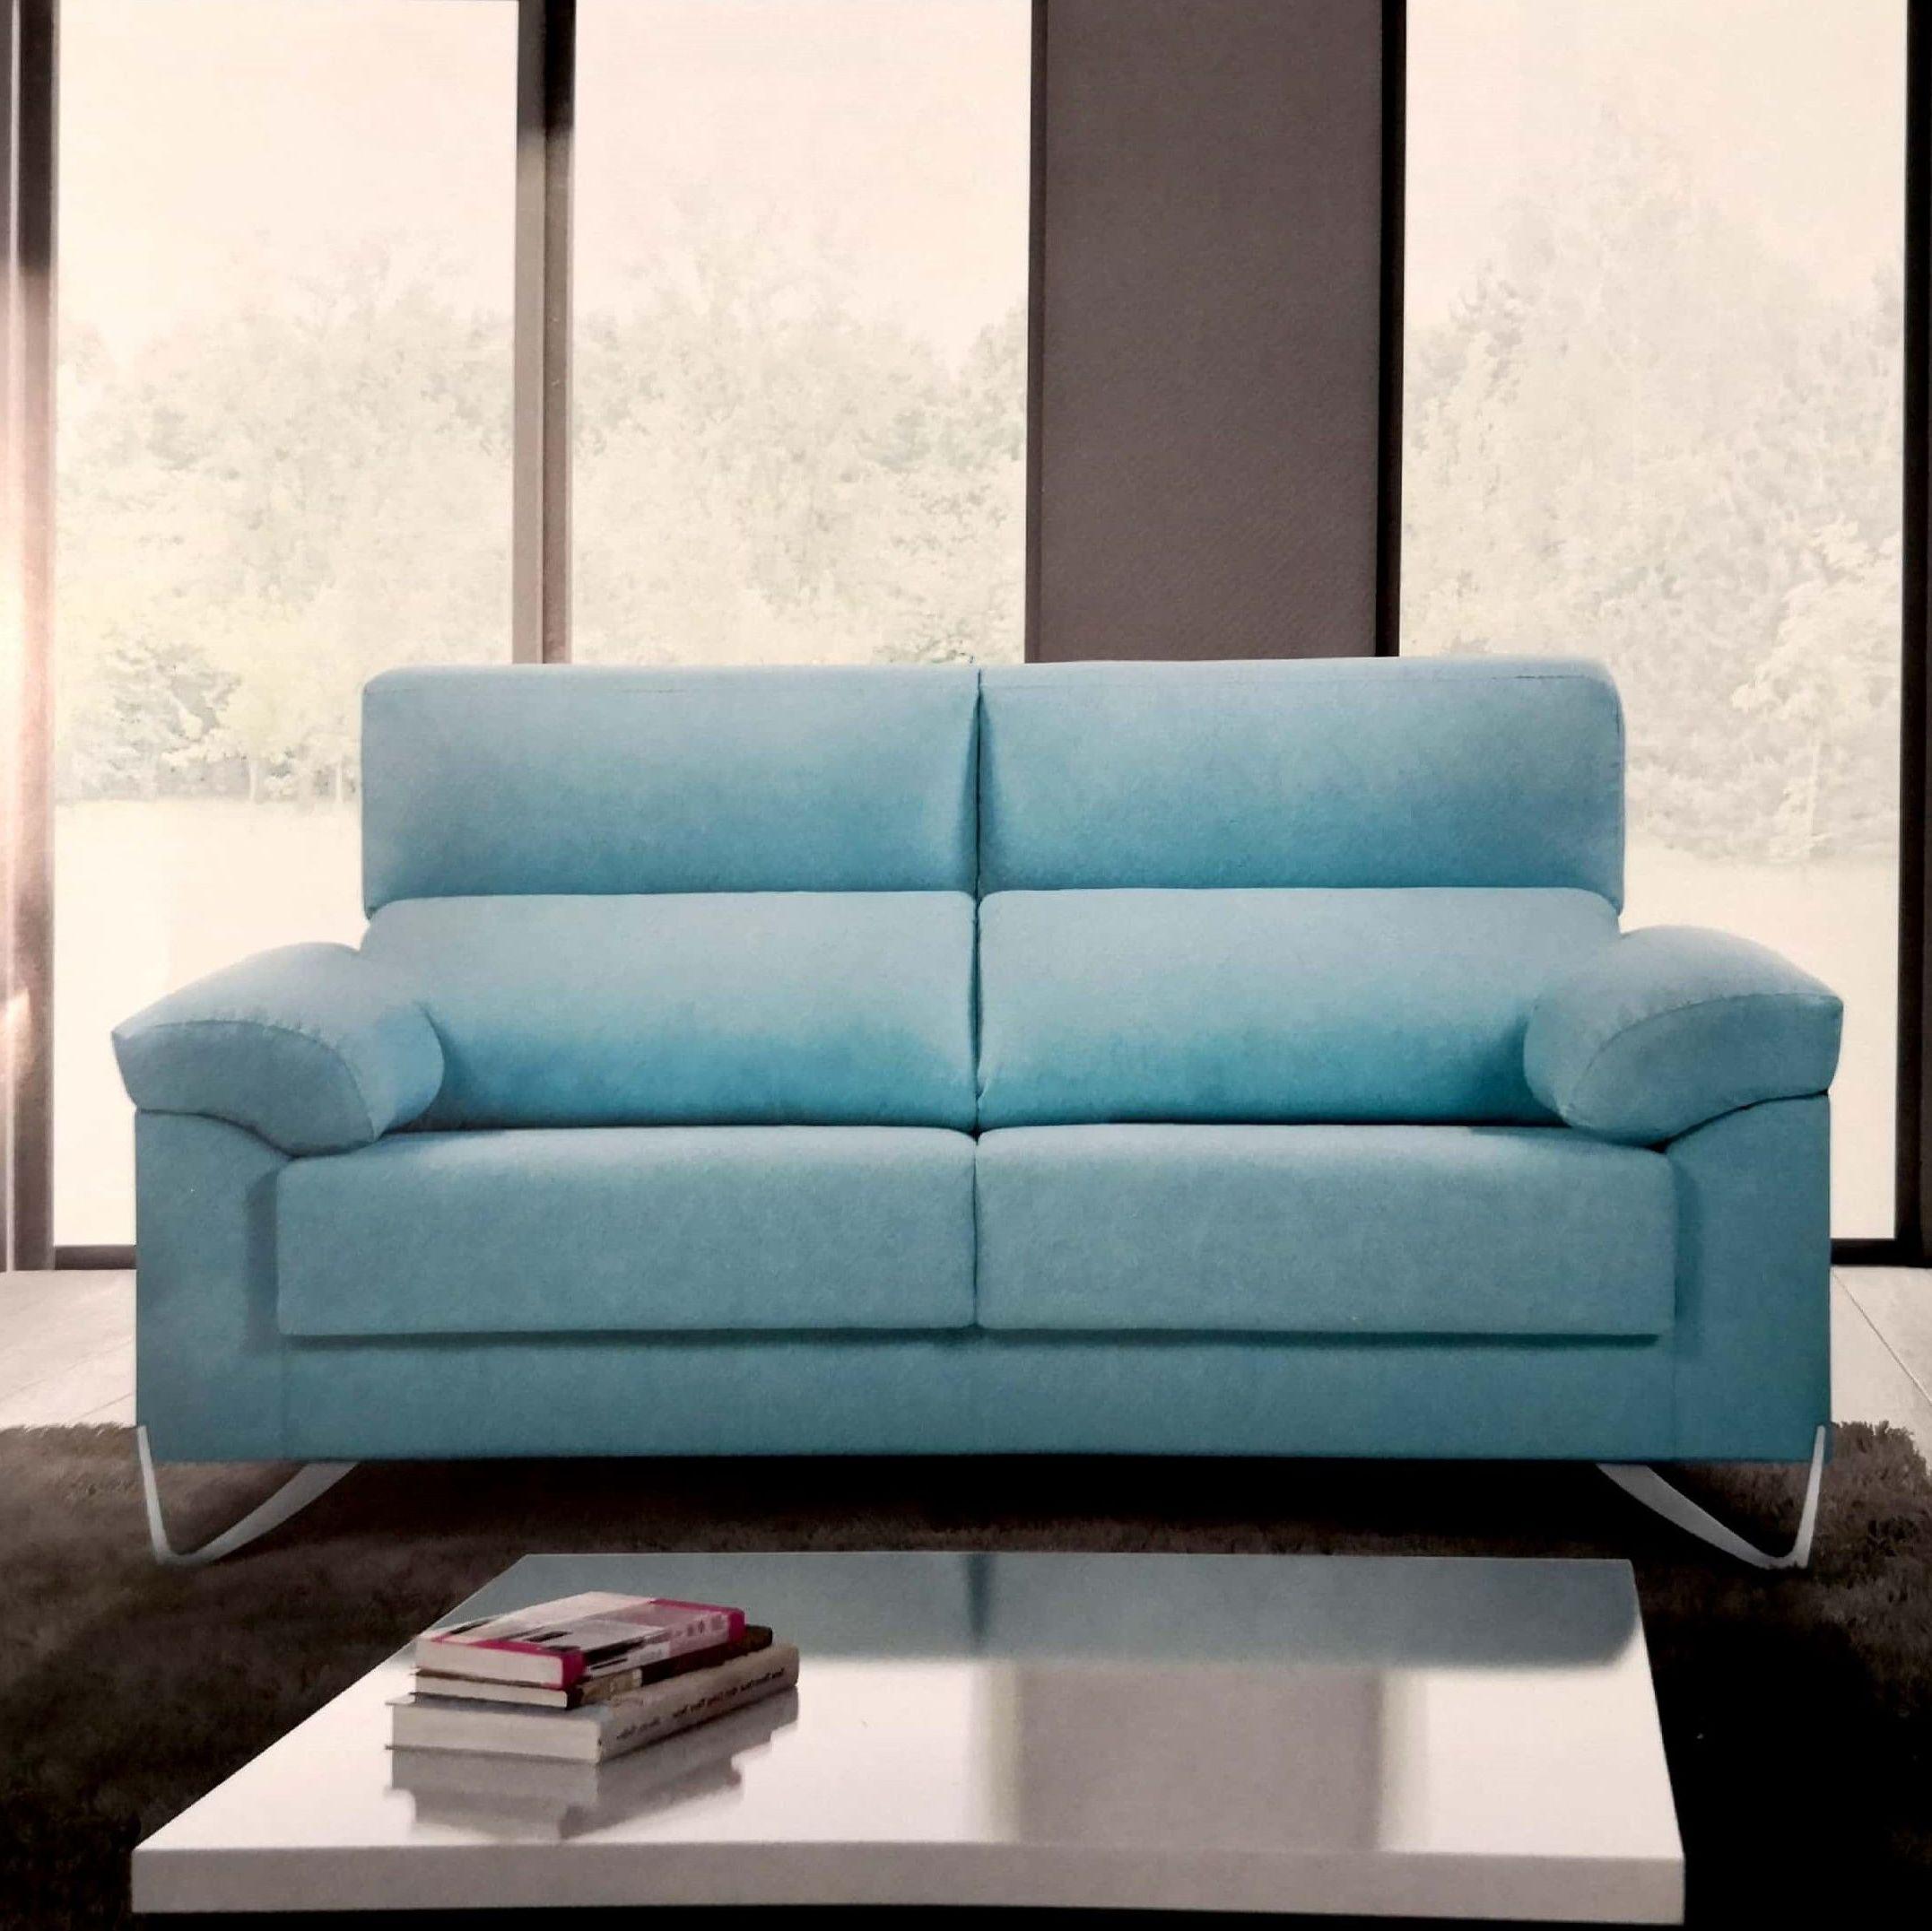 Sofa Condor 3 Plazas Desde 430€ 2 Plazas 350€